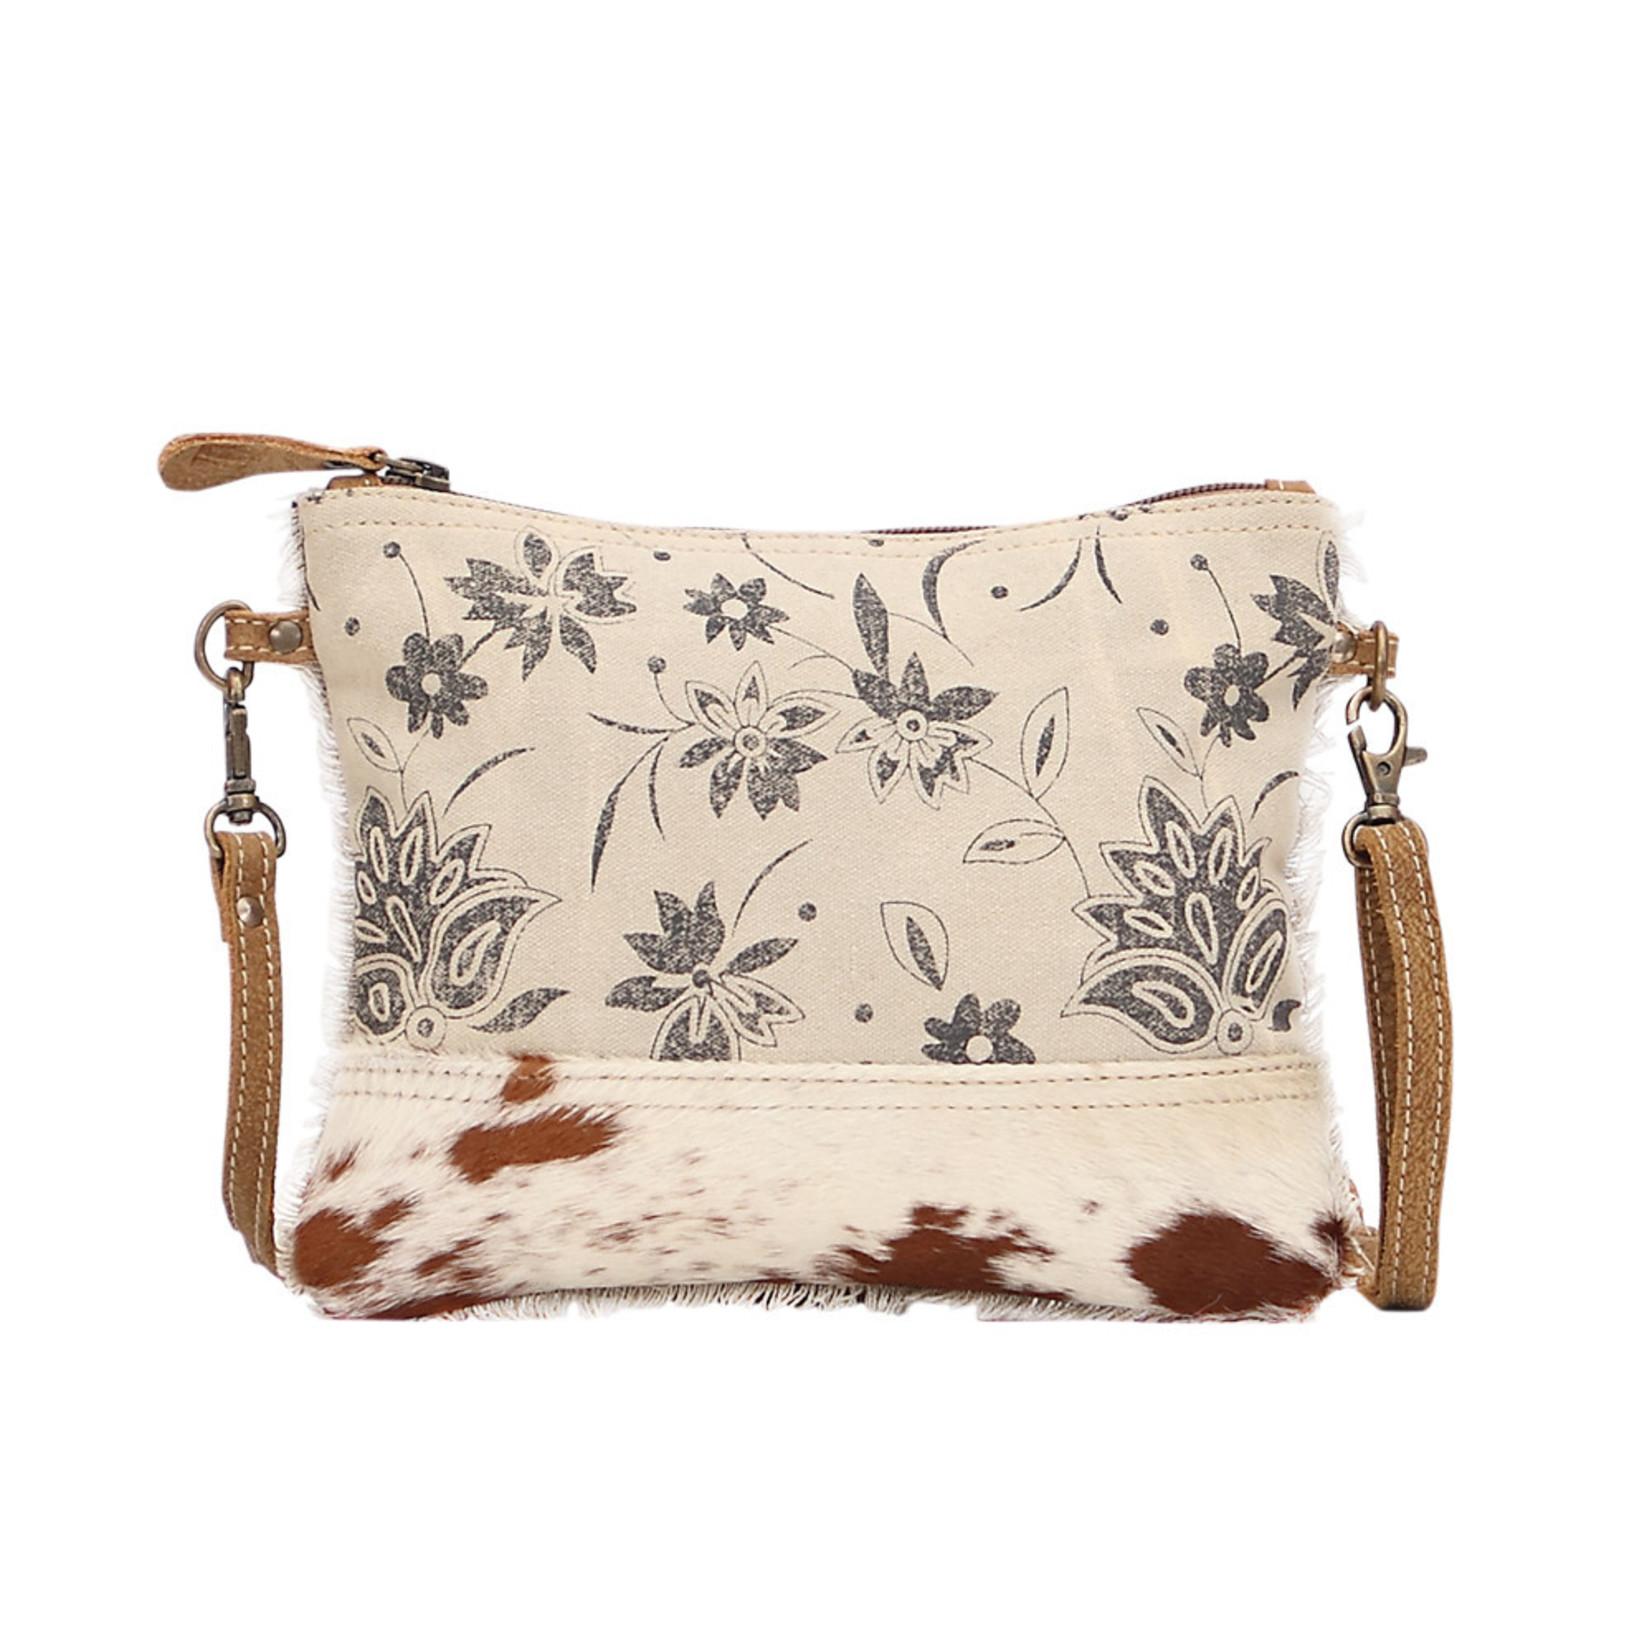 Myra Bags S-1497 Alluvium Small & Crossbody Bag